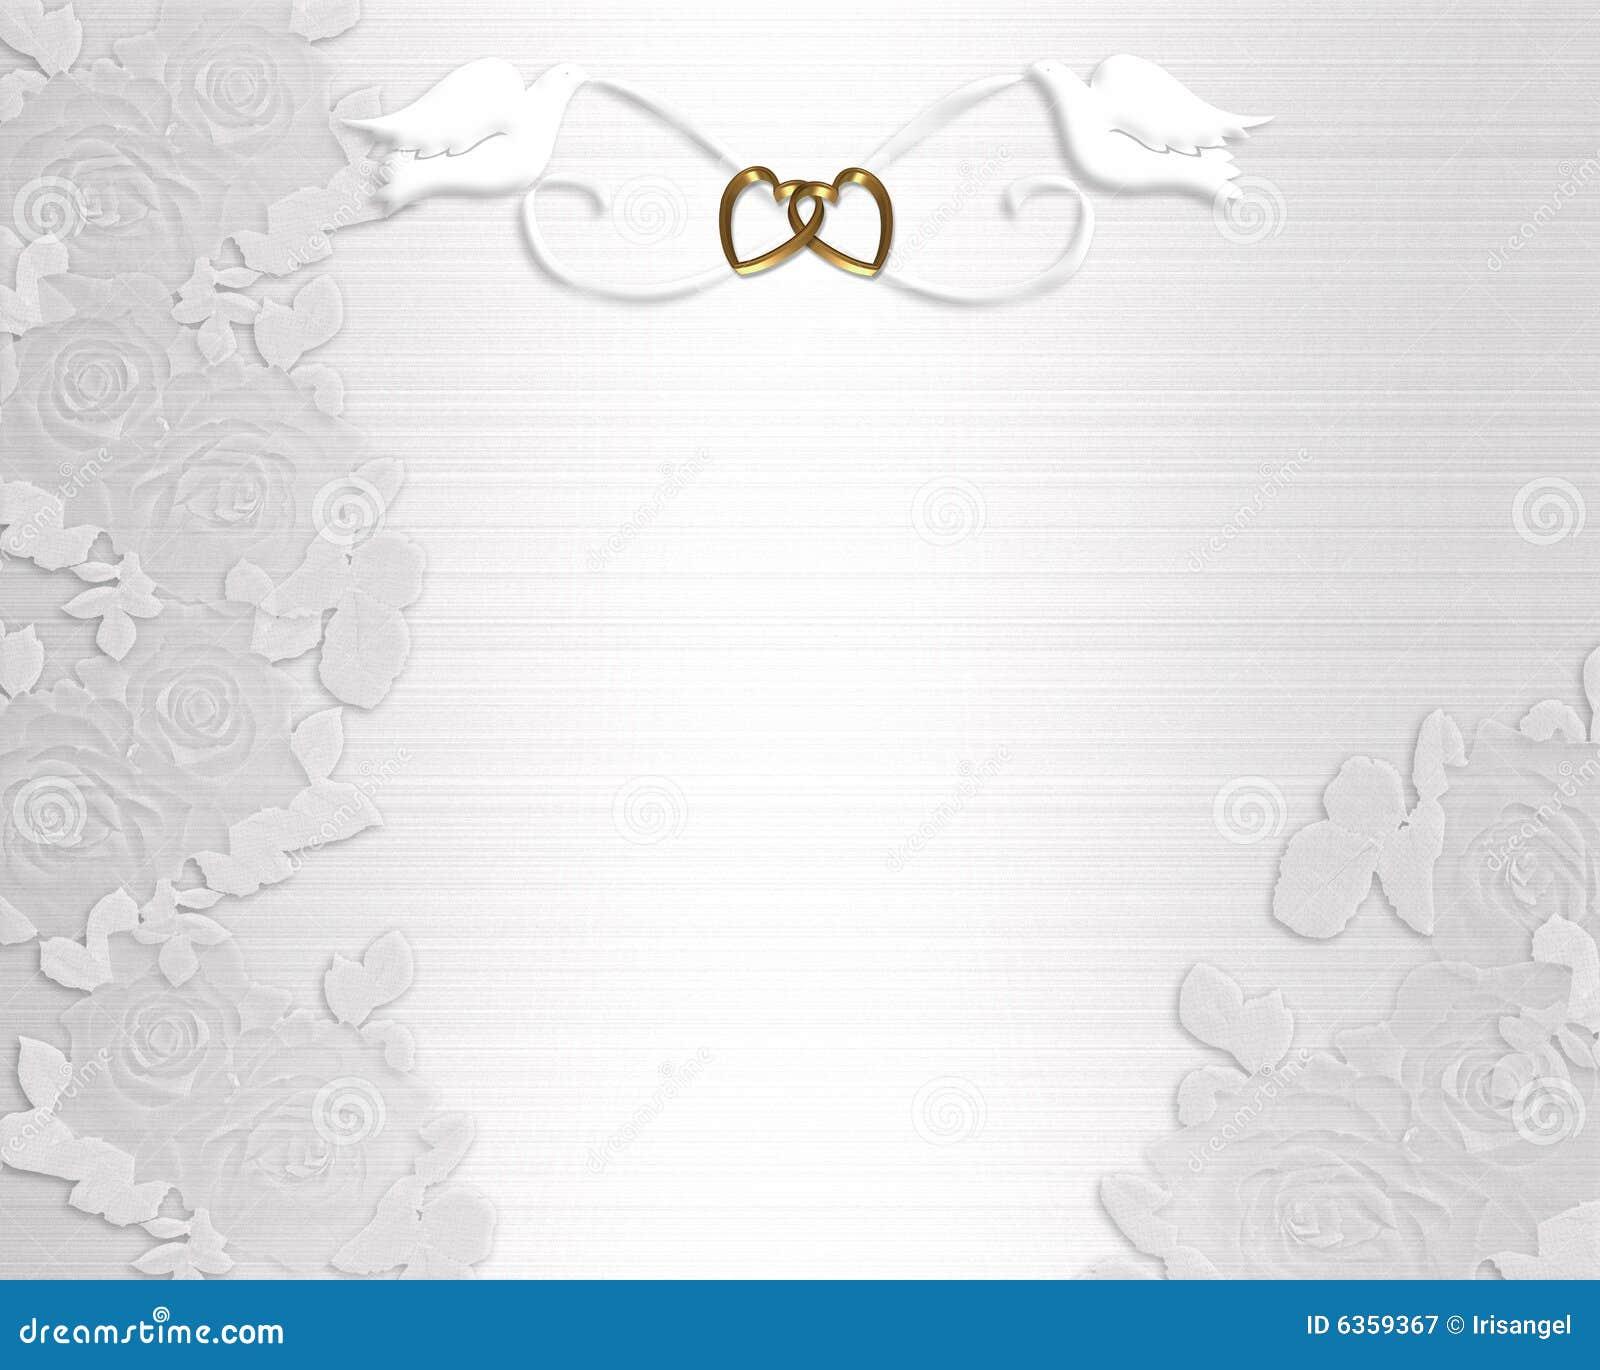 Fondos Para Tarjetas De Boda Beautiful Fondos Para Tarjetas De Boda - Fondo-invitacion-boda